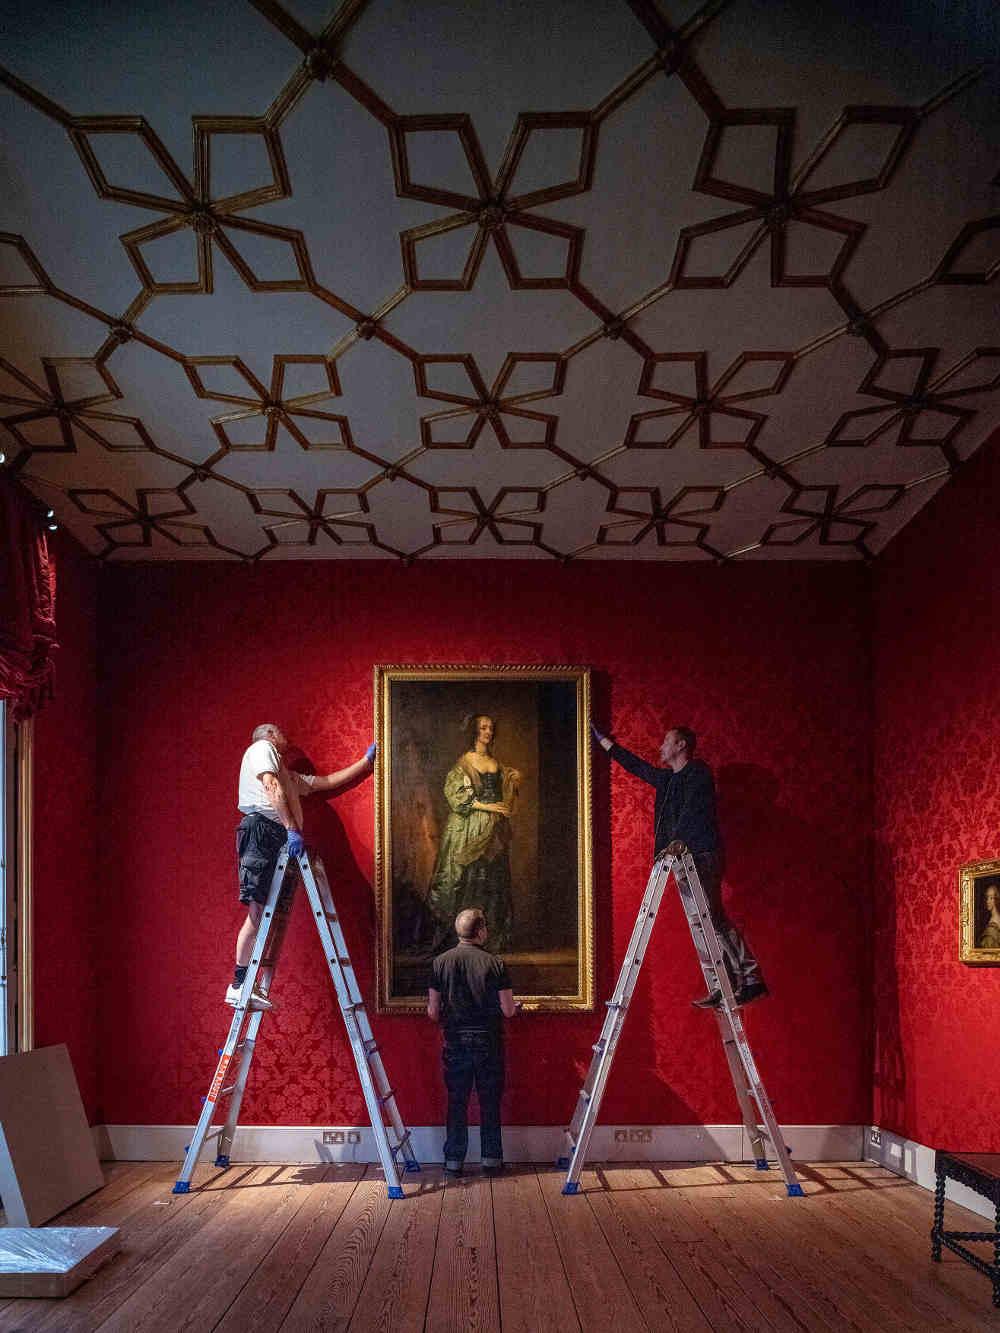 Lost Treasures, Strawberry Hill, Walpole, Catherine the Great, van Dyck